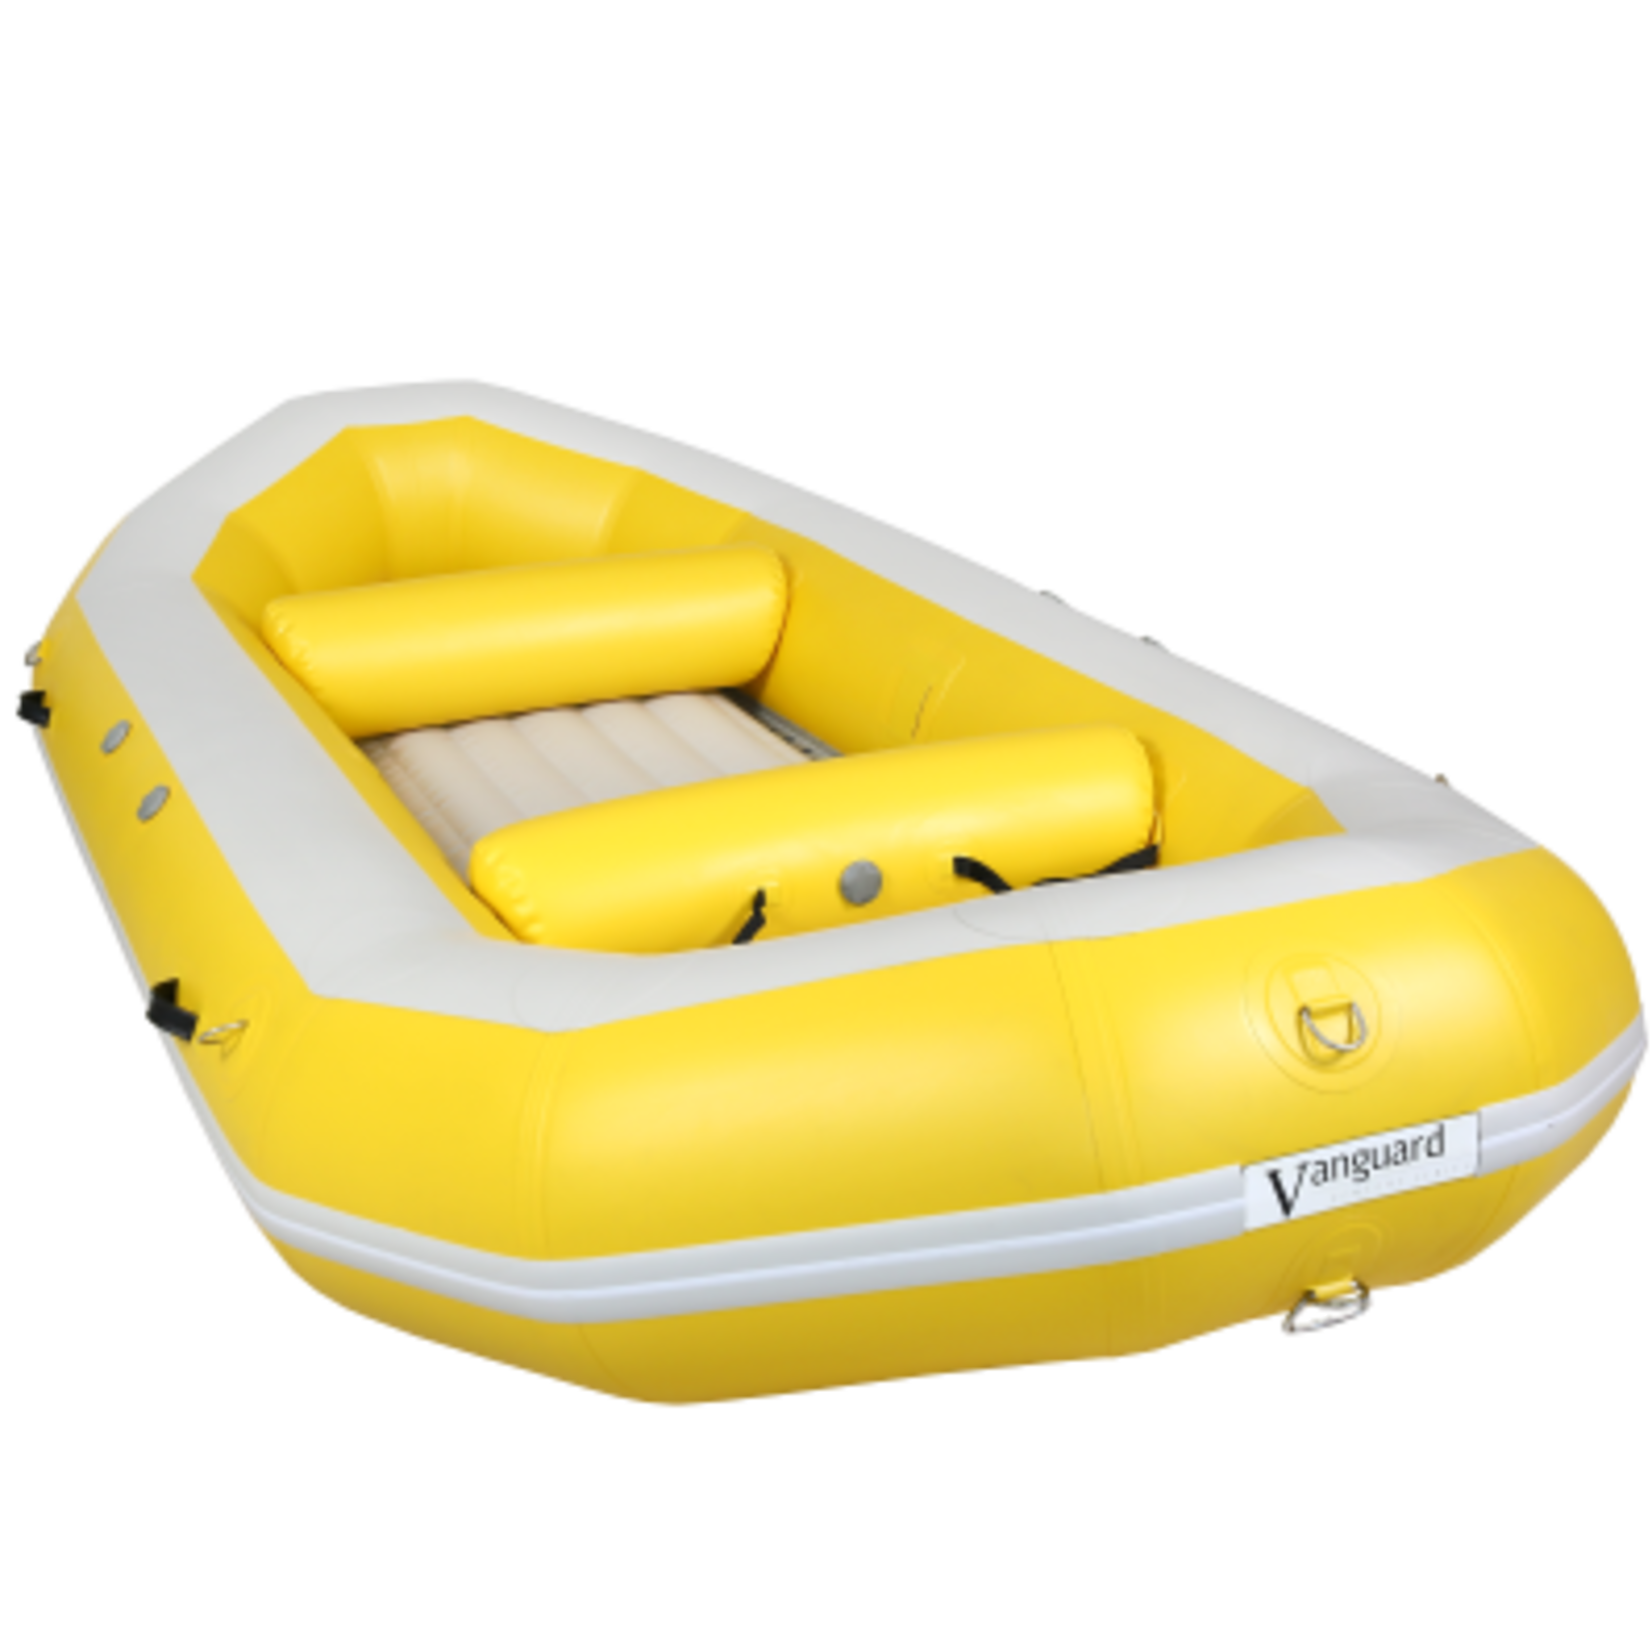 Vanguard Inflatables Vanguard Venture Series 1402 Self Bailing Raft